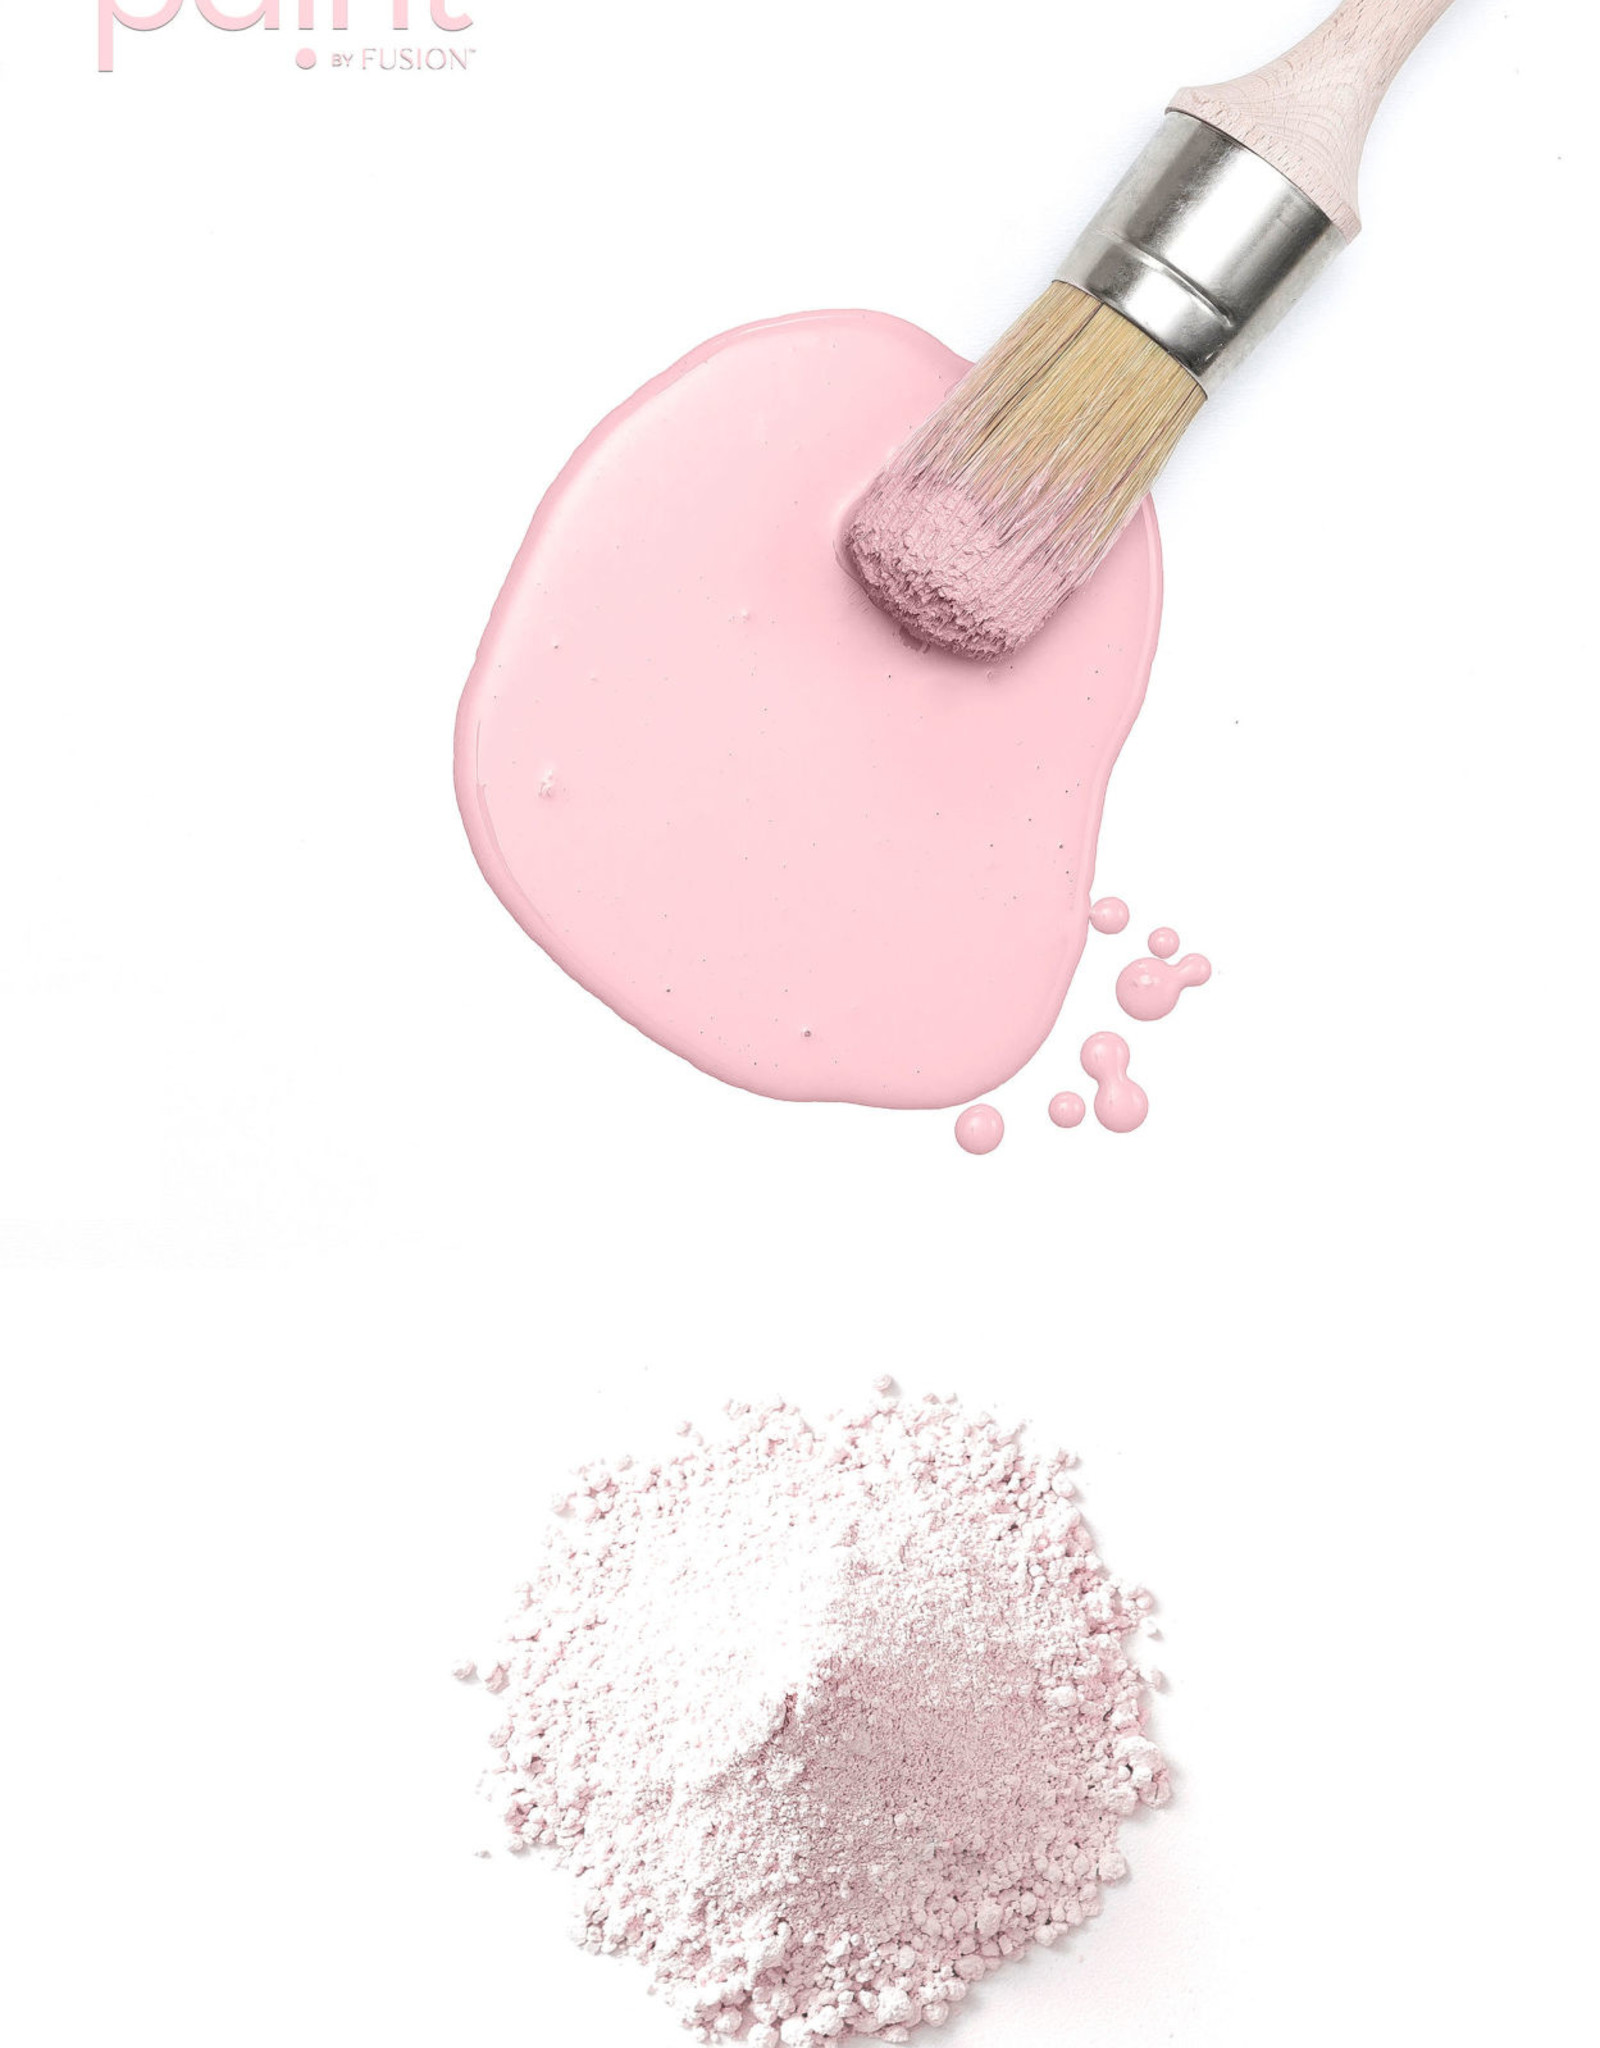 Fusion Mineral Paint Milk Paint 50g Millennial Pink